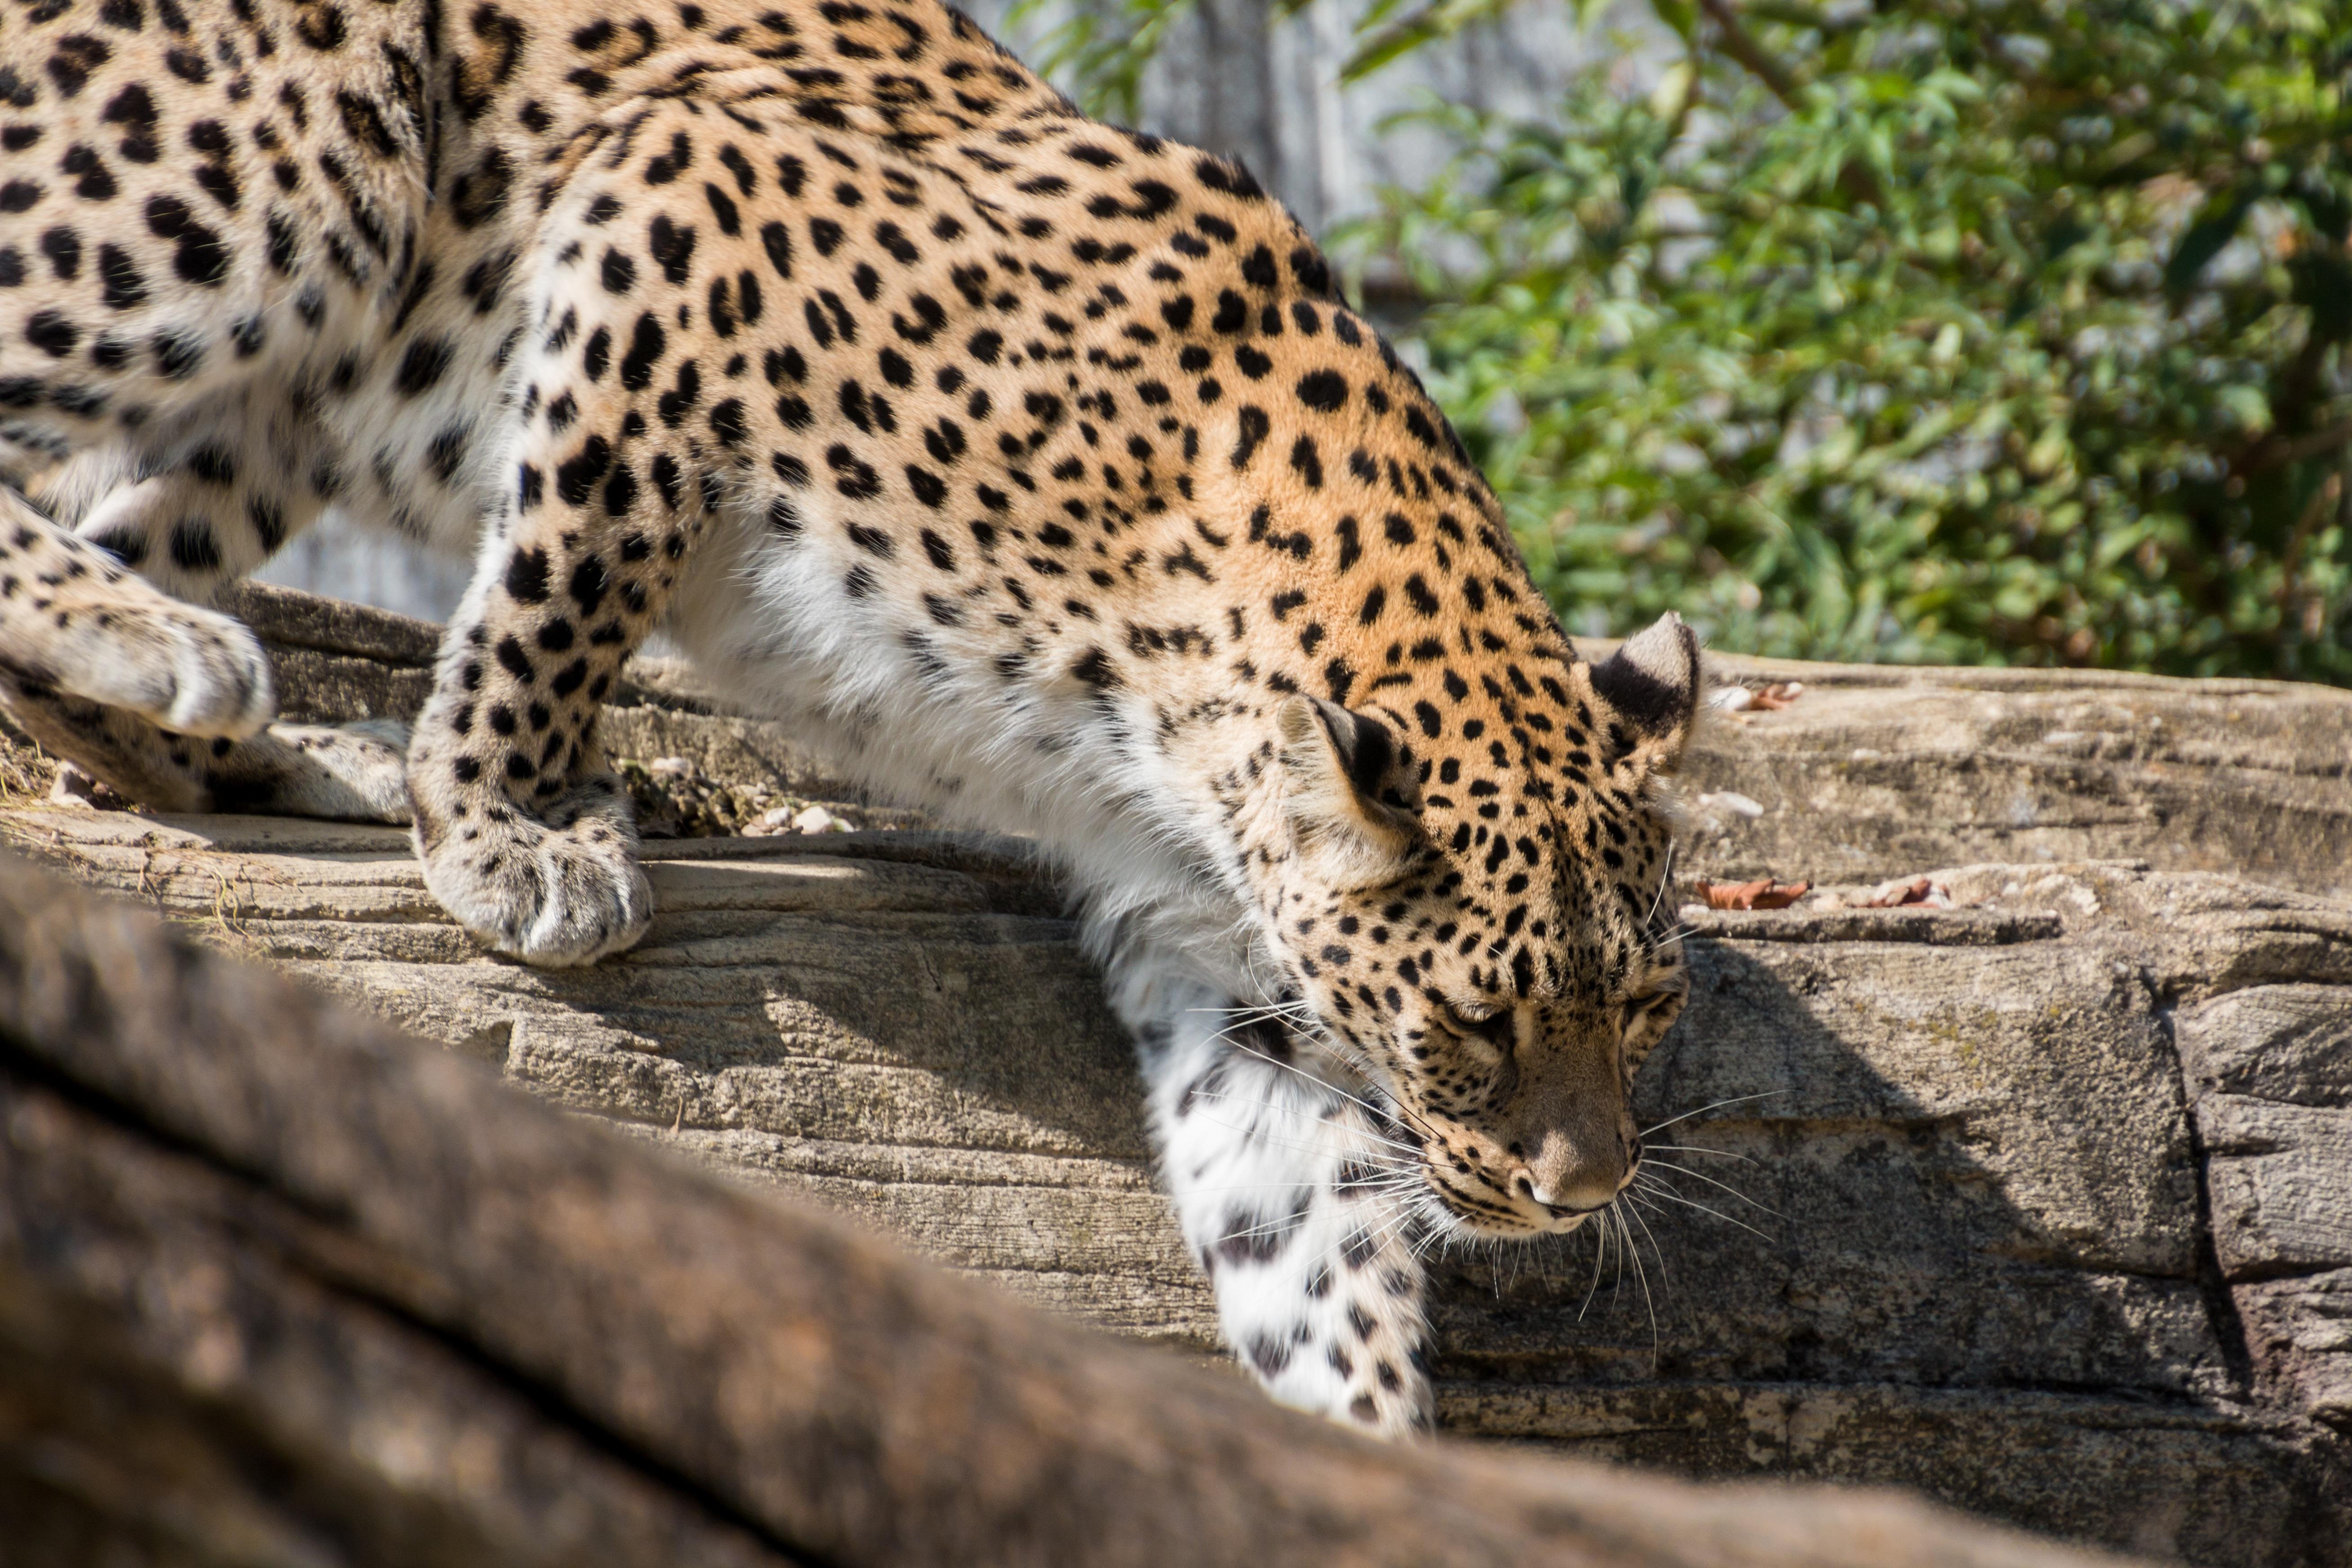 Gambar : margasatwa, kebun binatang, binatang menyusui